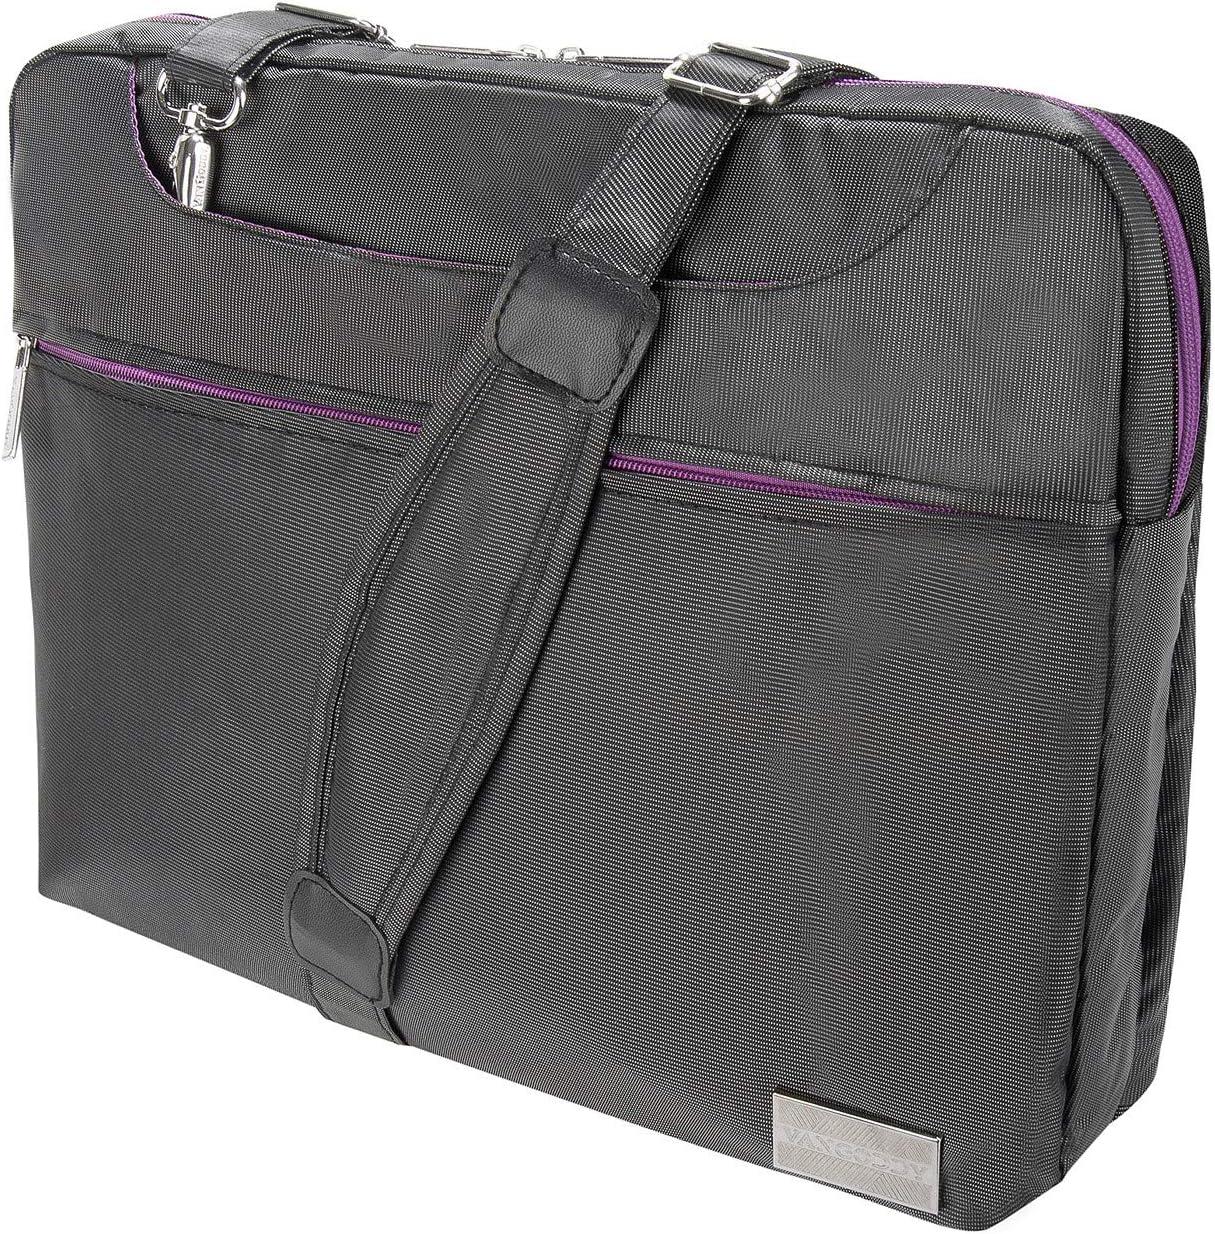 13 Messenger Bag for HP Elite Dragonfly, HP Envy 13t, Lenovo ThinkPad X1 Carbon